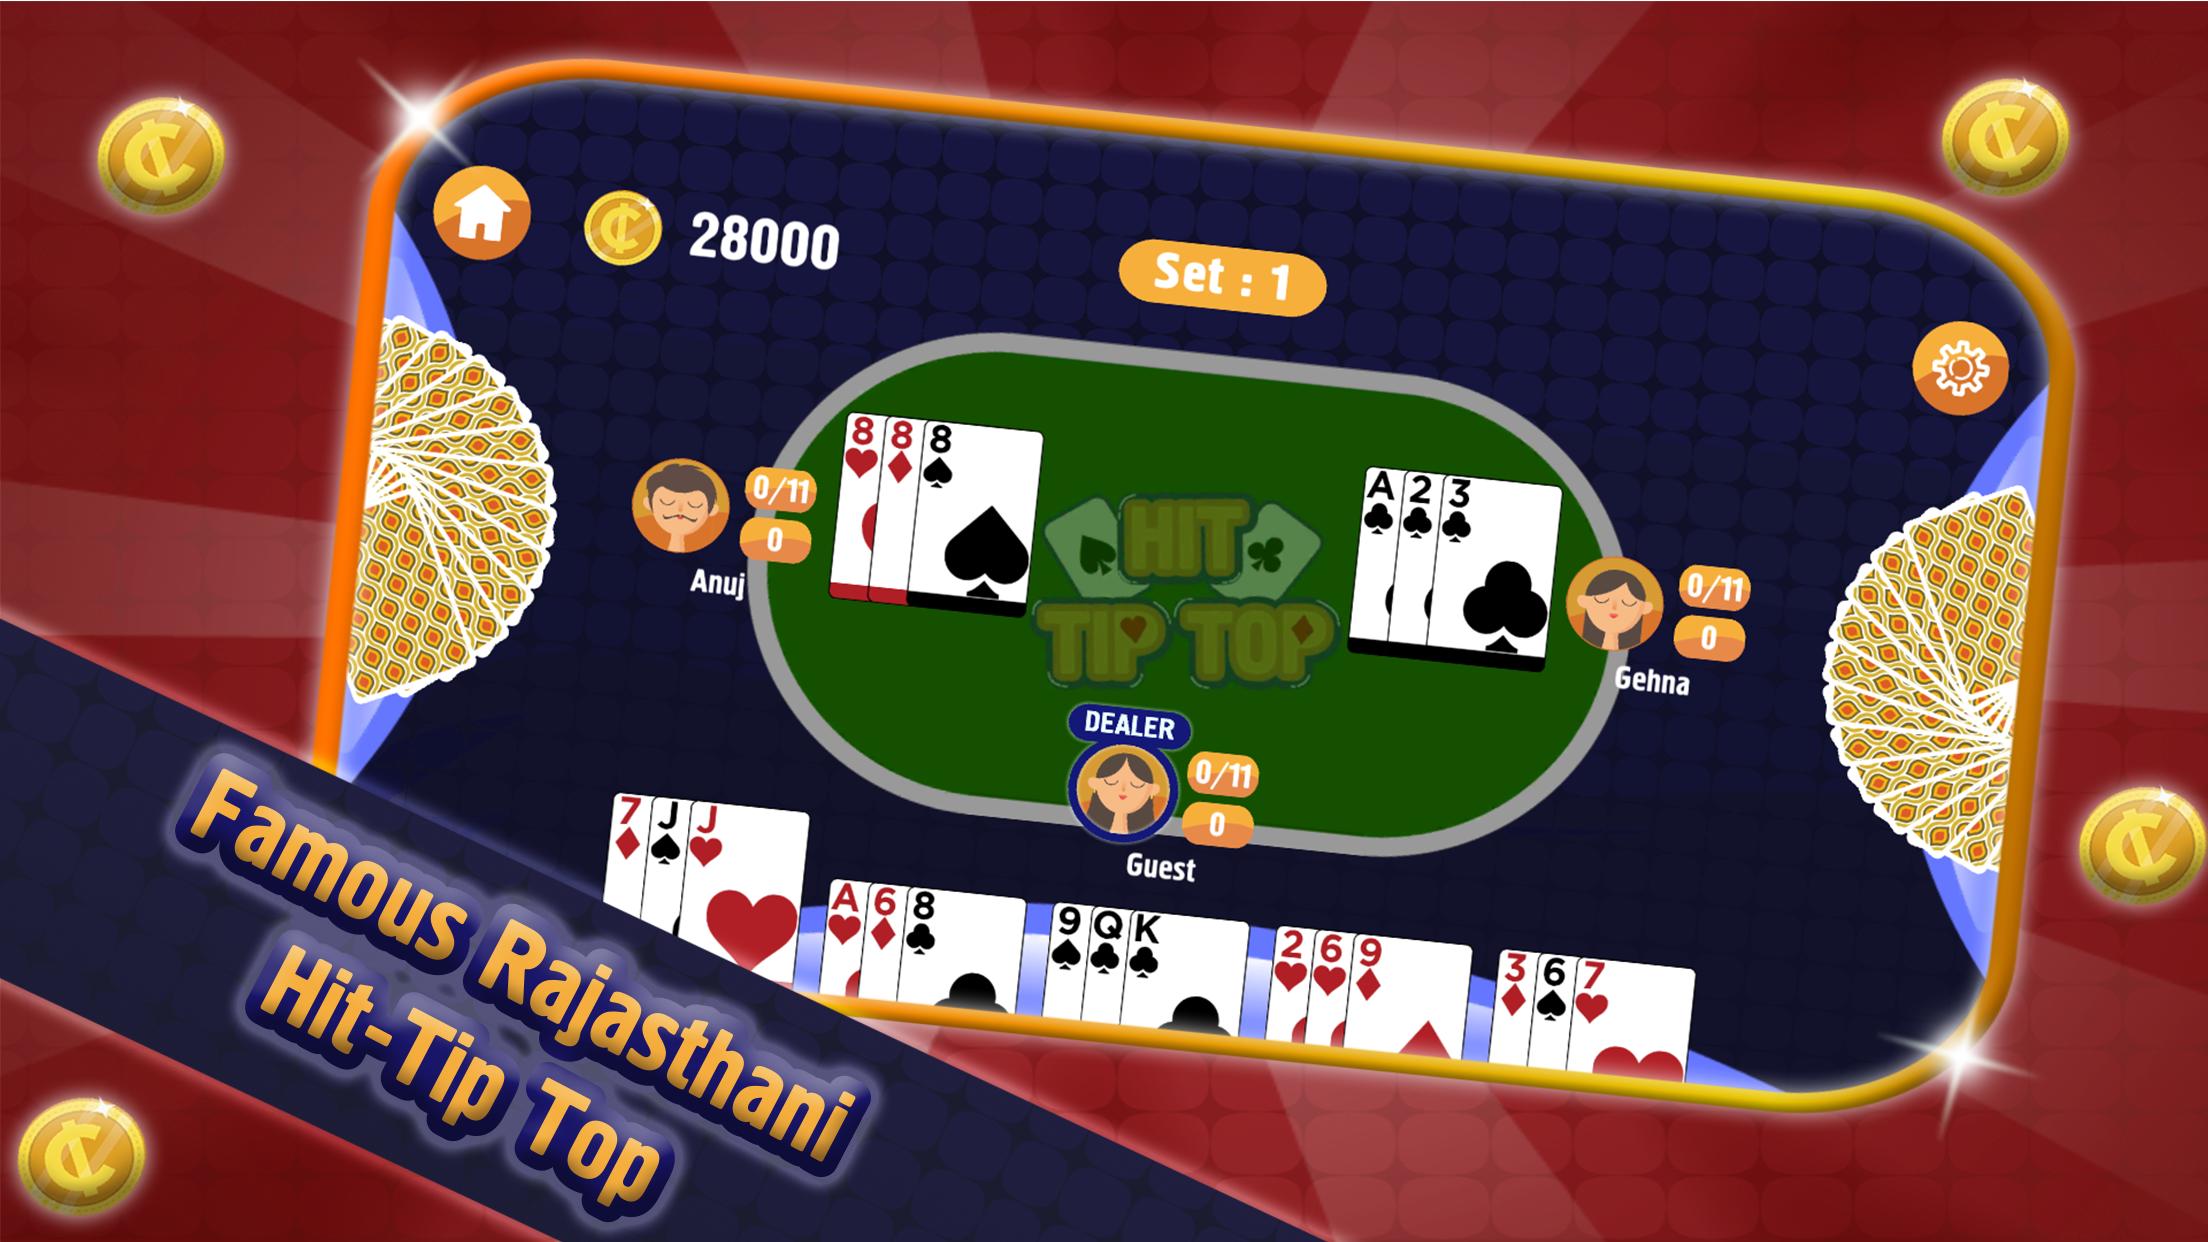 Hit Tip Top Casino Kitty